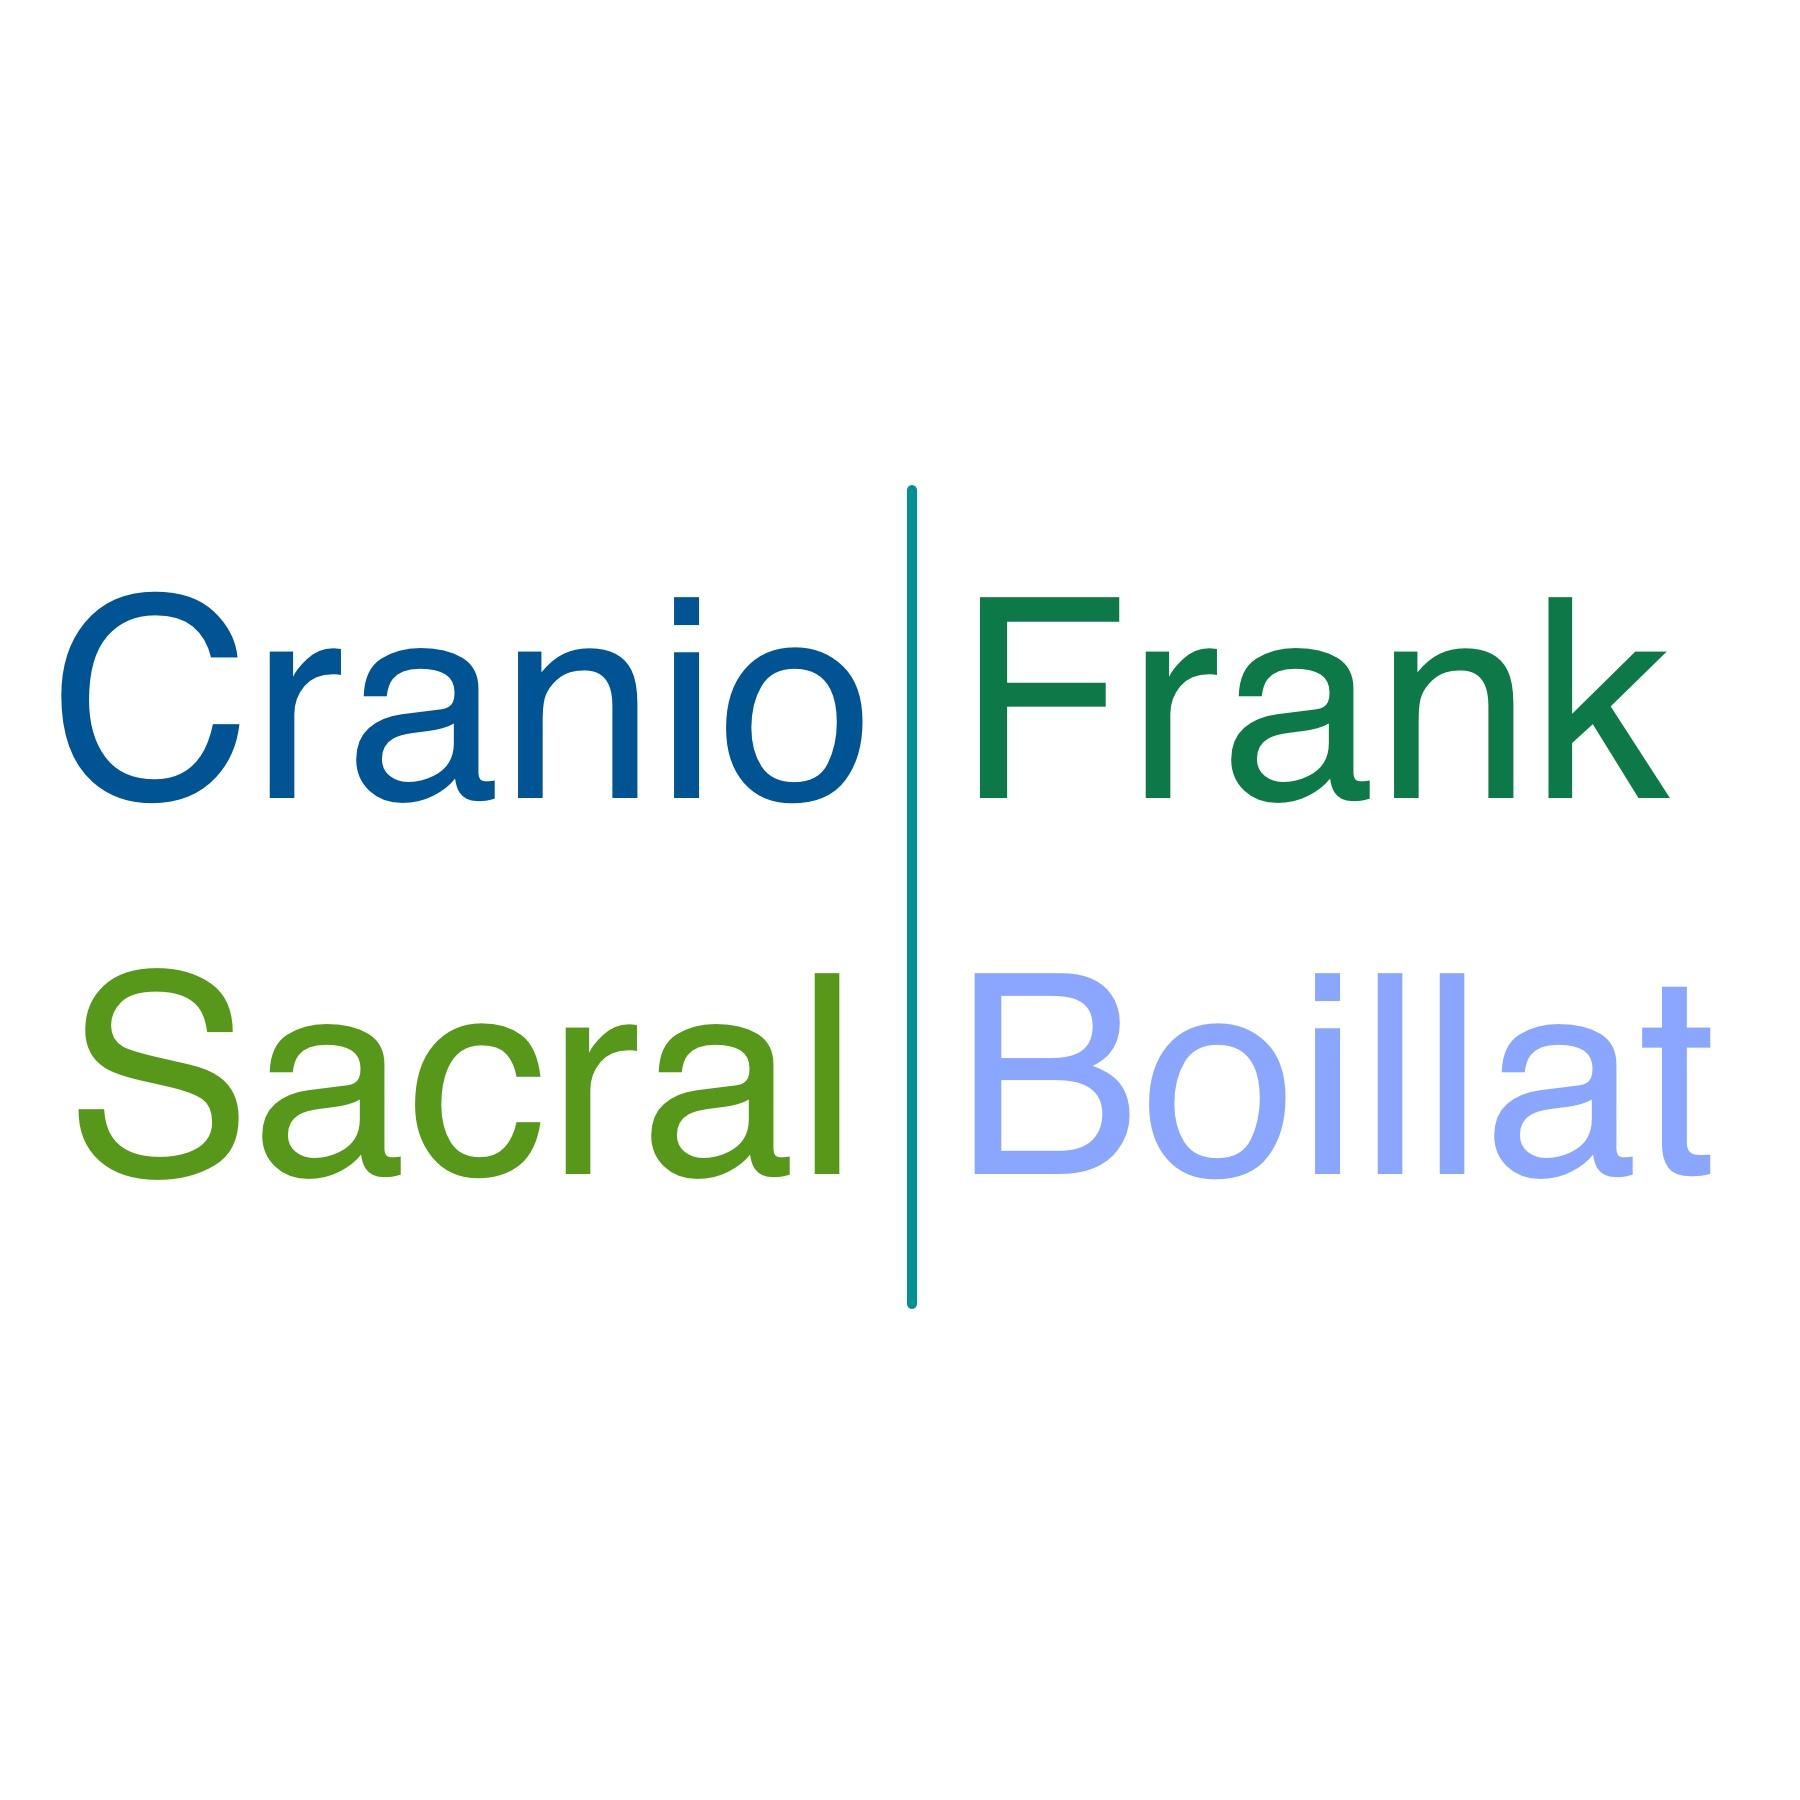 Craniosacral - Frank Boillat